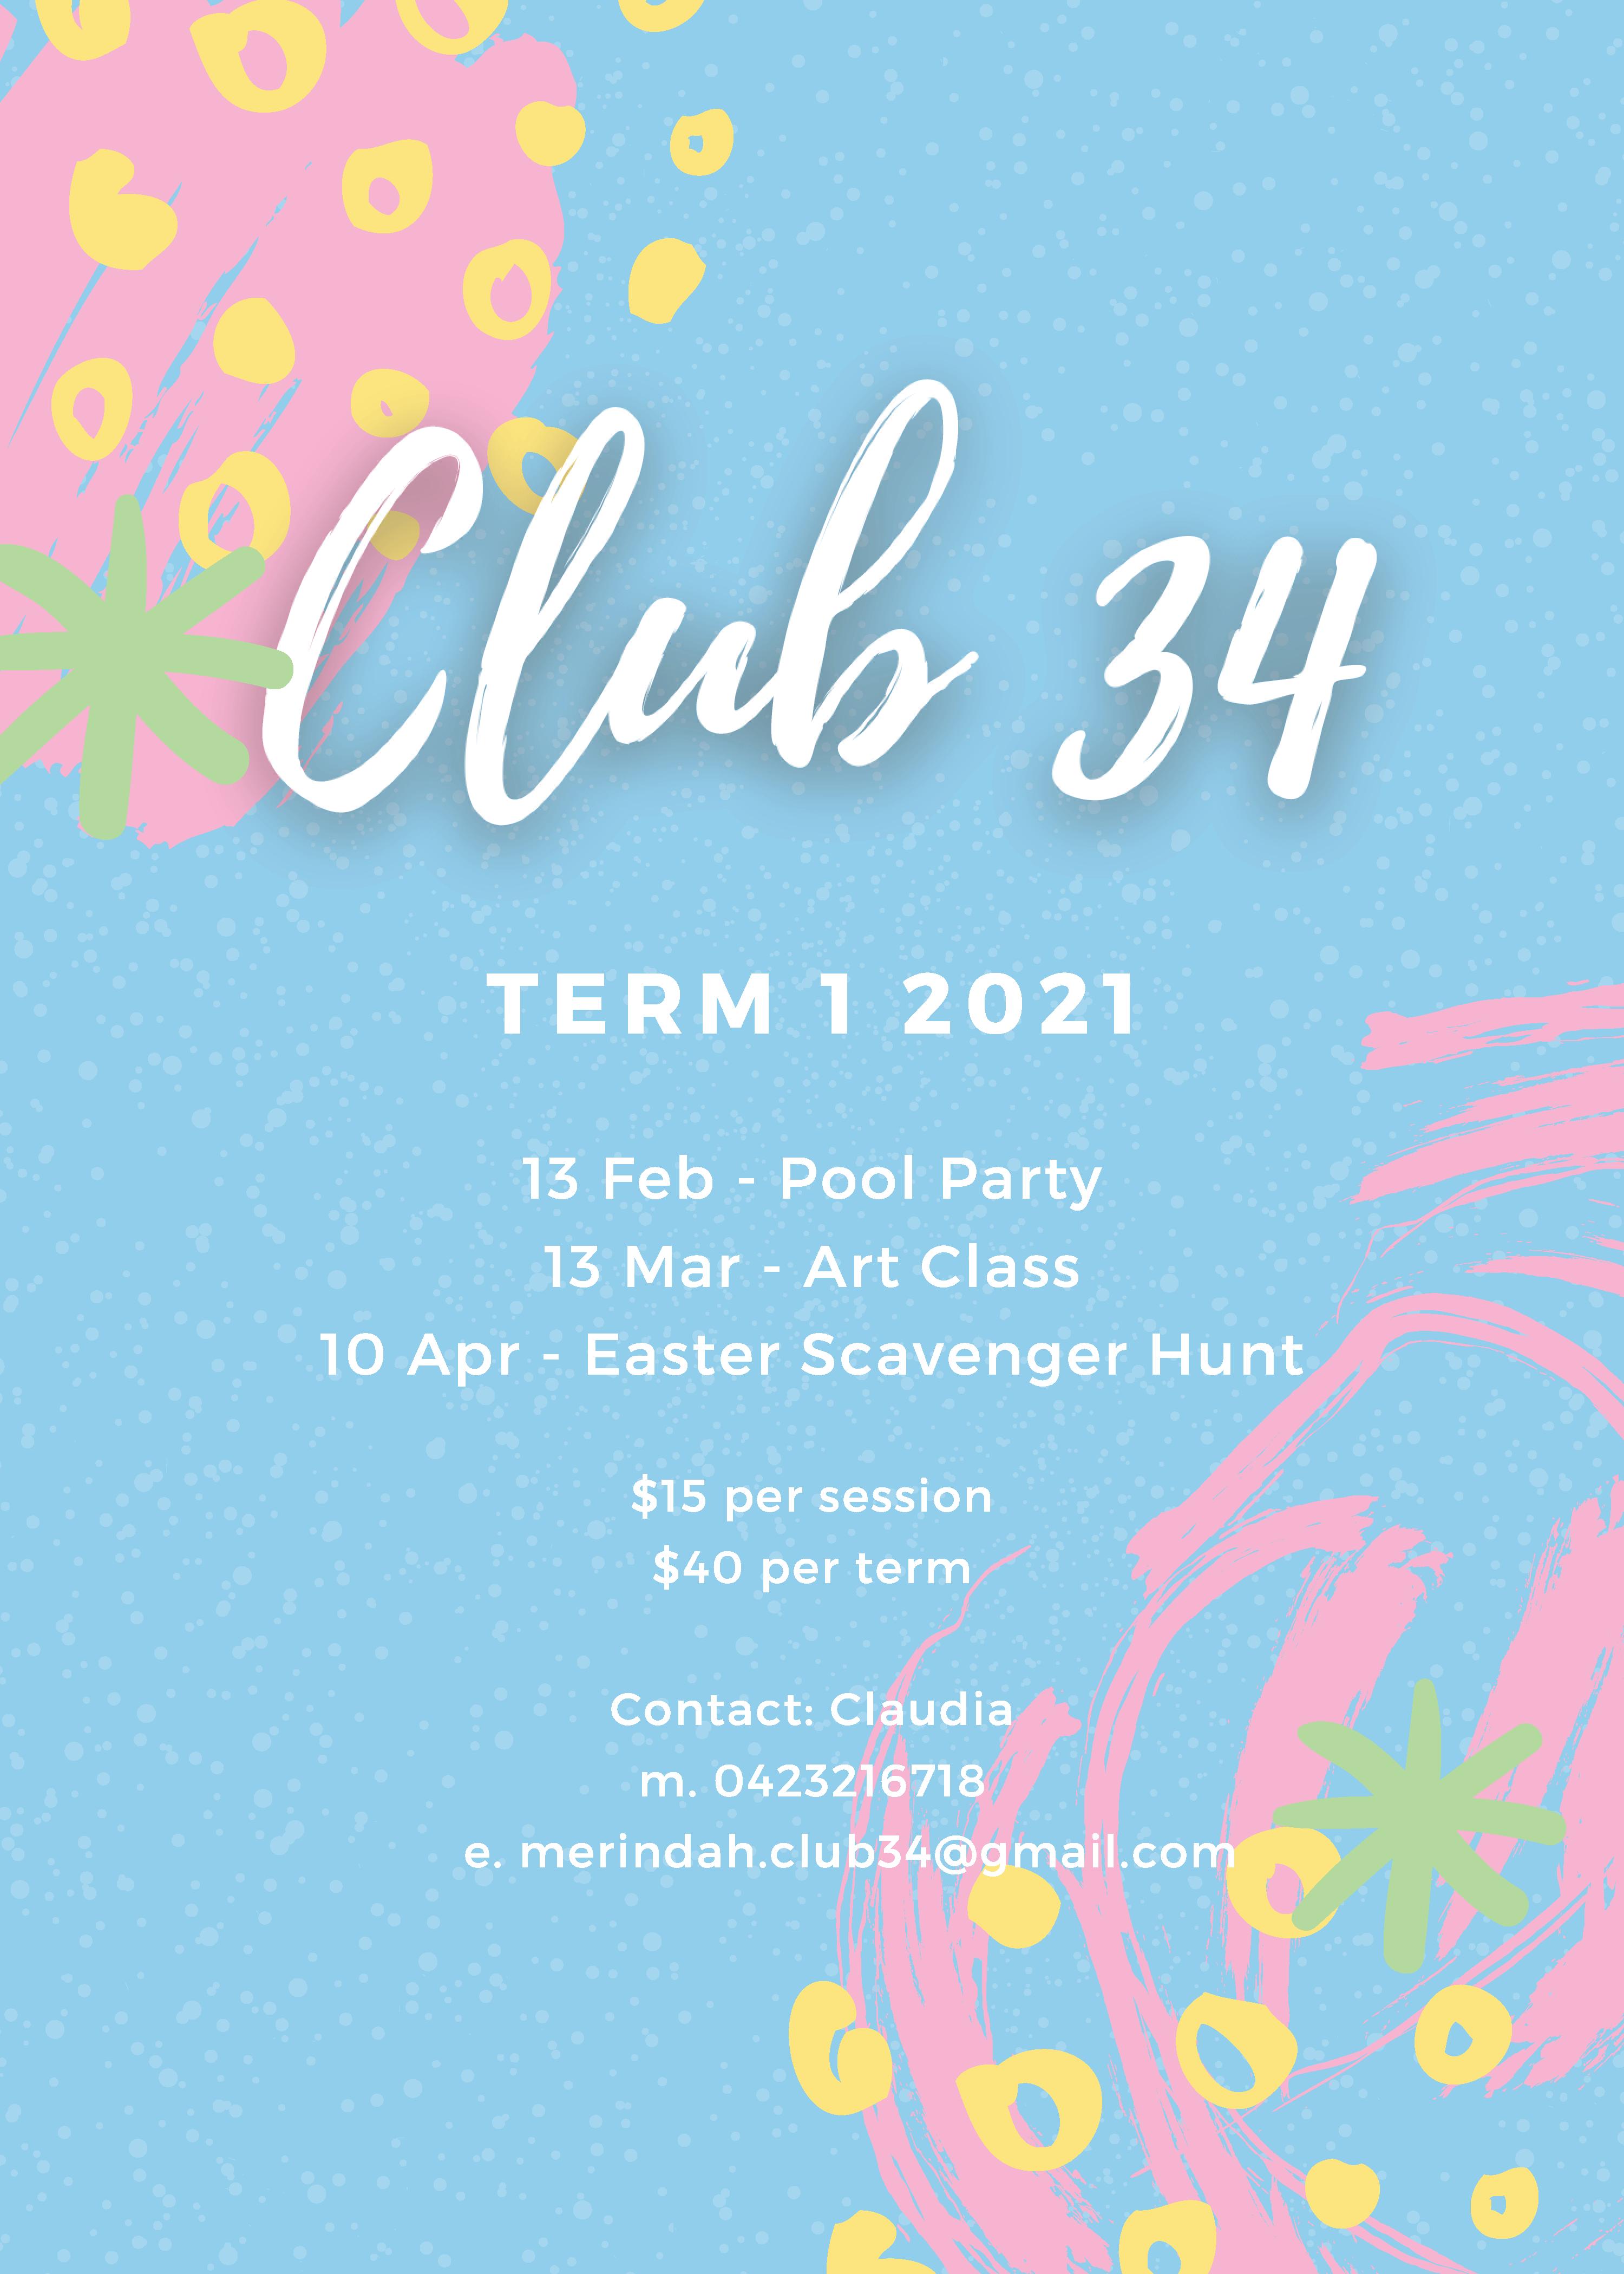 Club34 - Term1 2021